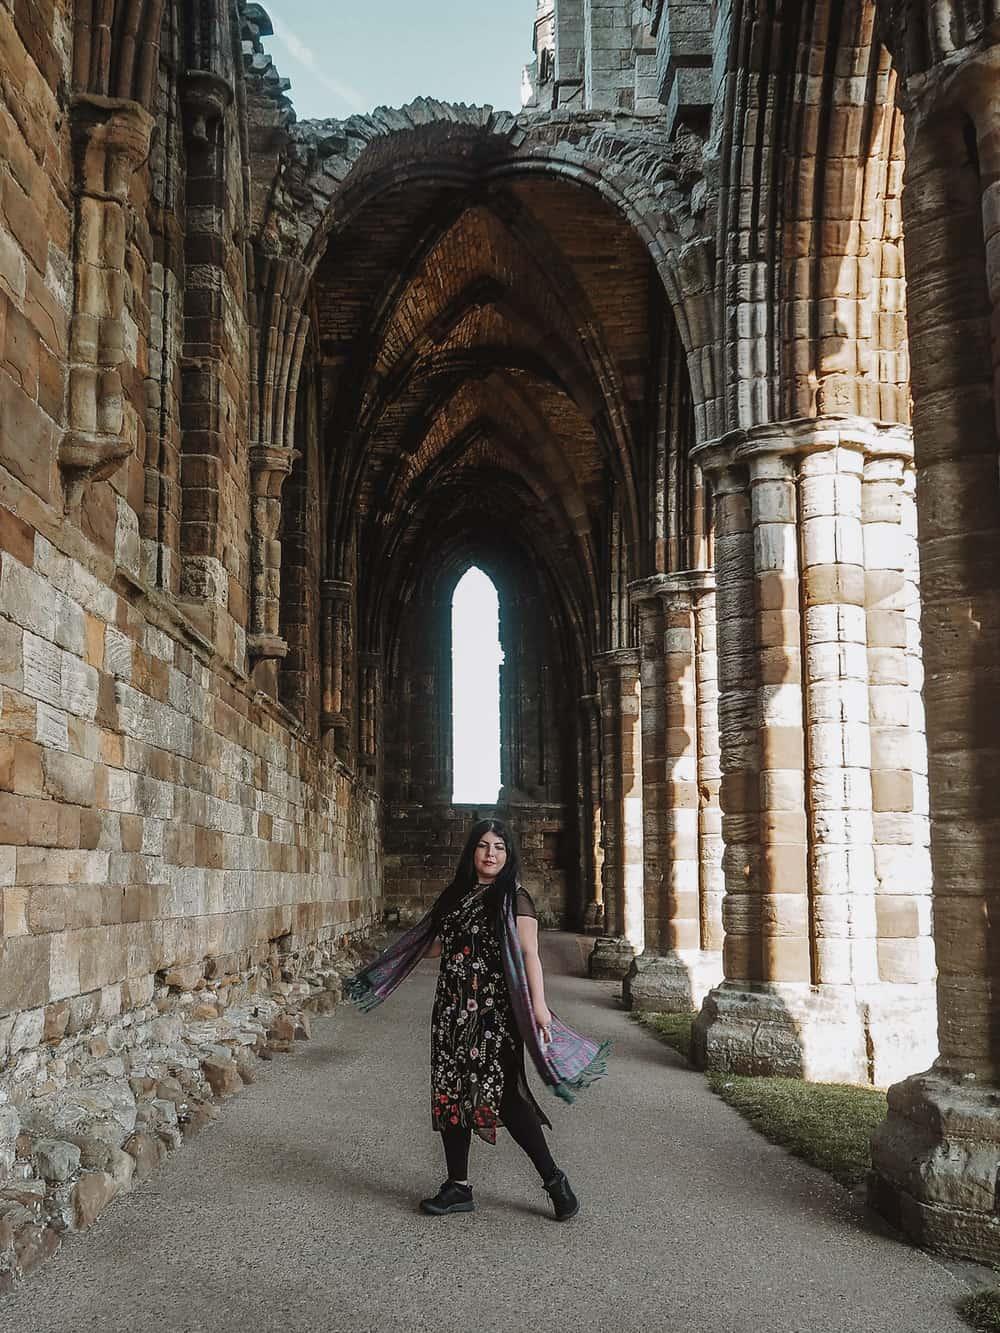 Dracula in Whitby Abbey